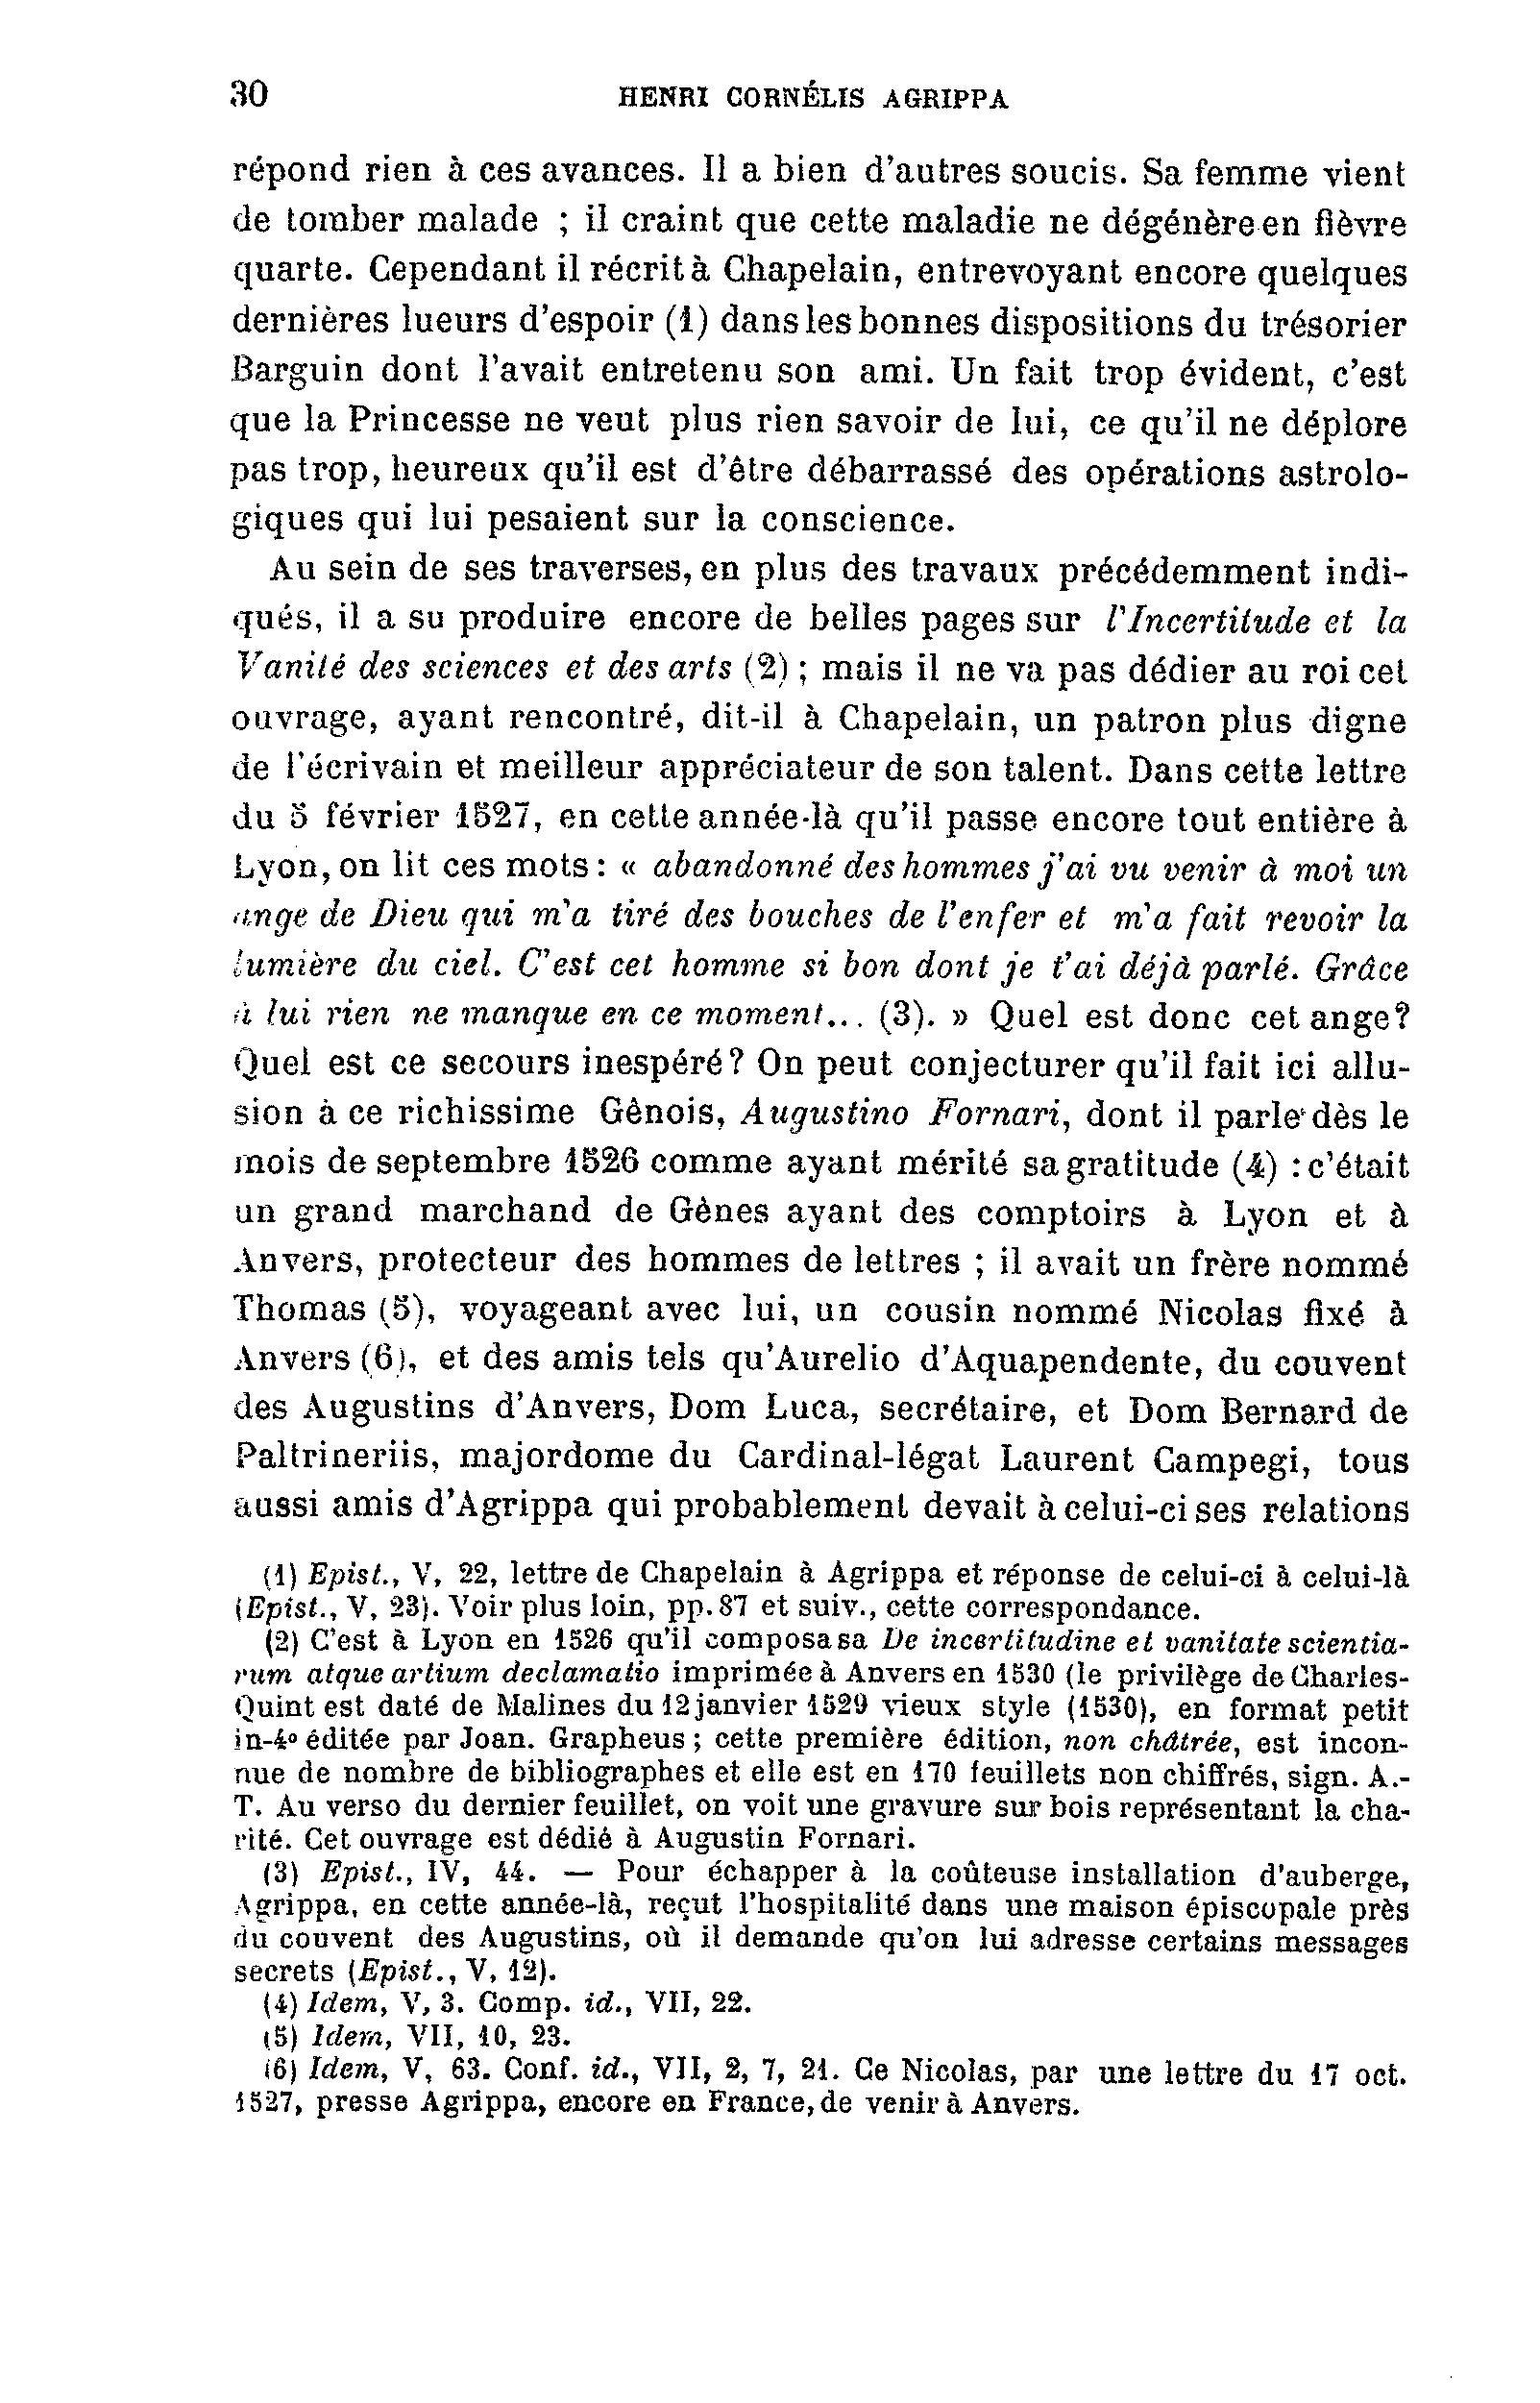 antithesis romeo juliet act 3